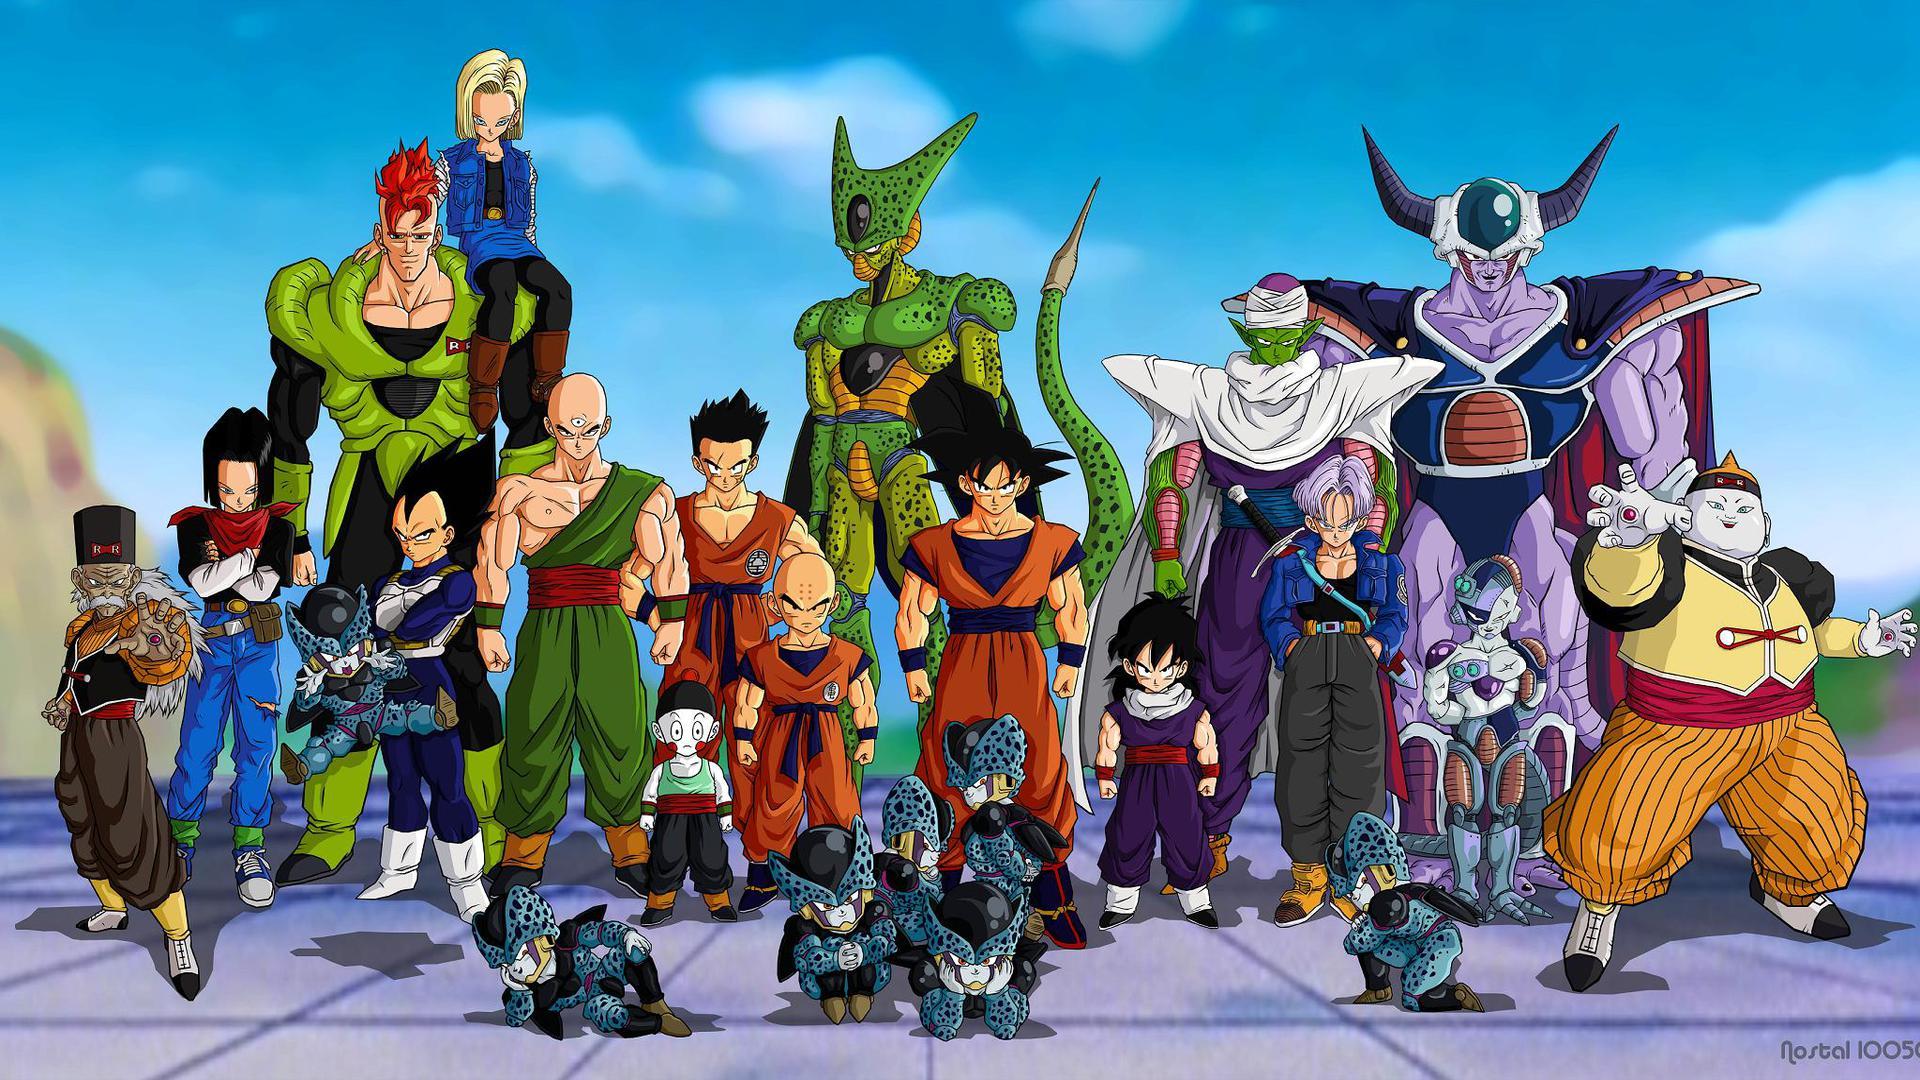 Dragon Ball Z Images HD Wallpaper of Anime 1920x1080